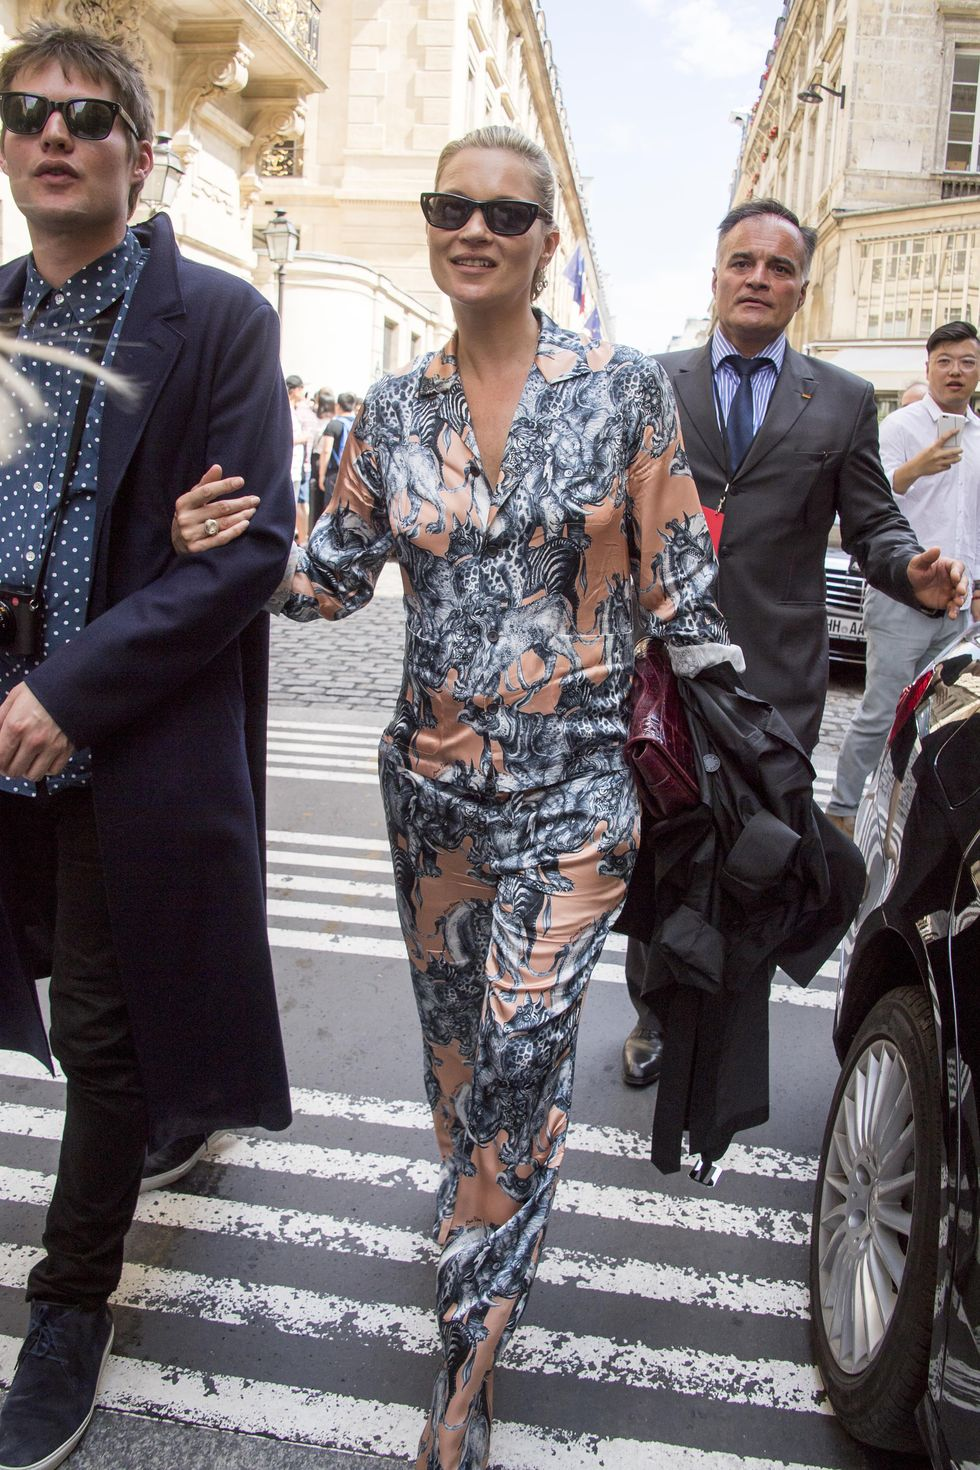 Intip Gaya Street Style Kate Moss, Selalu Statement!